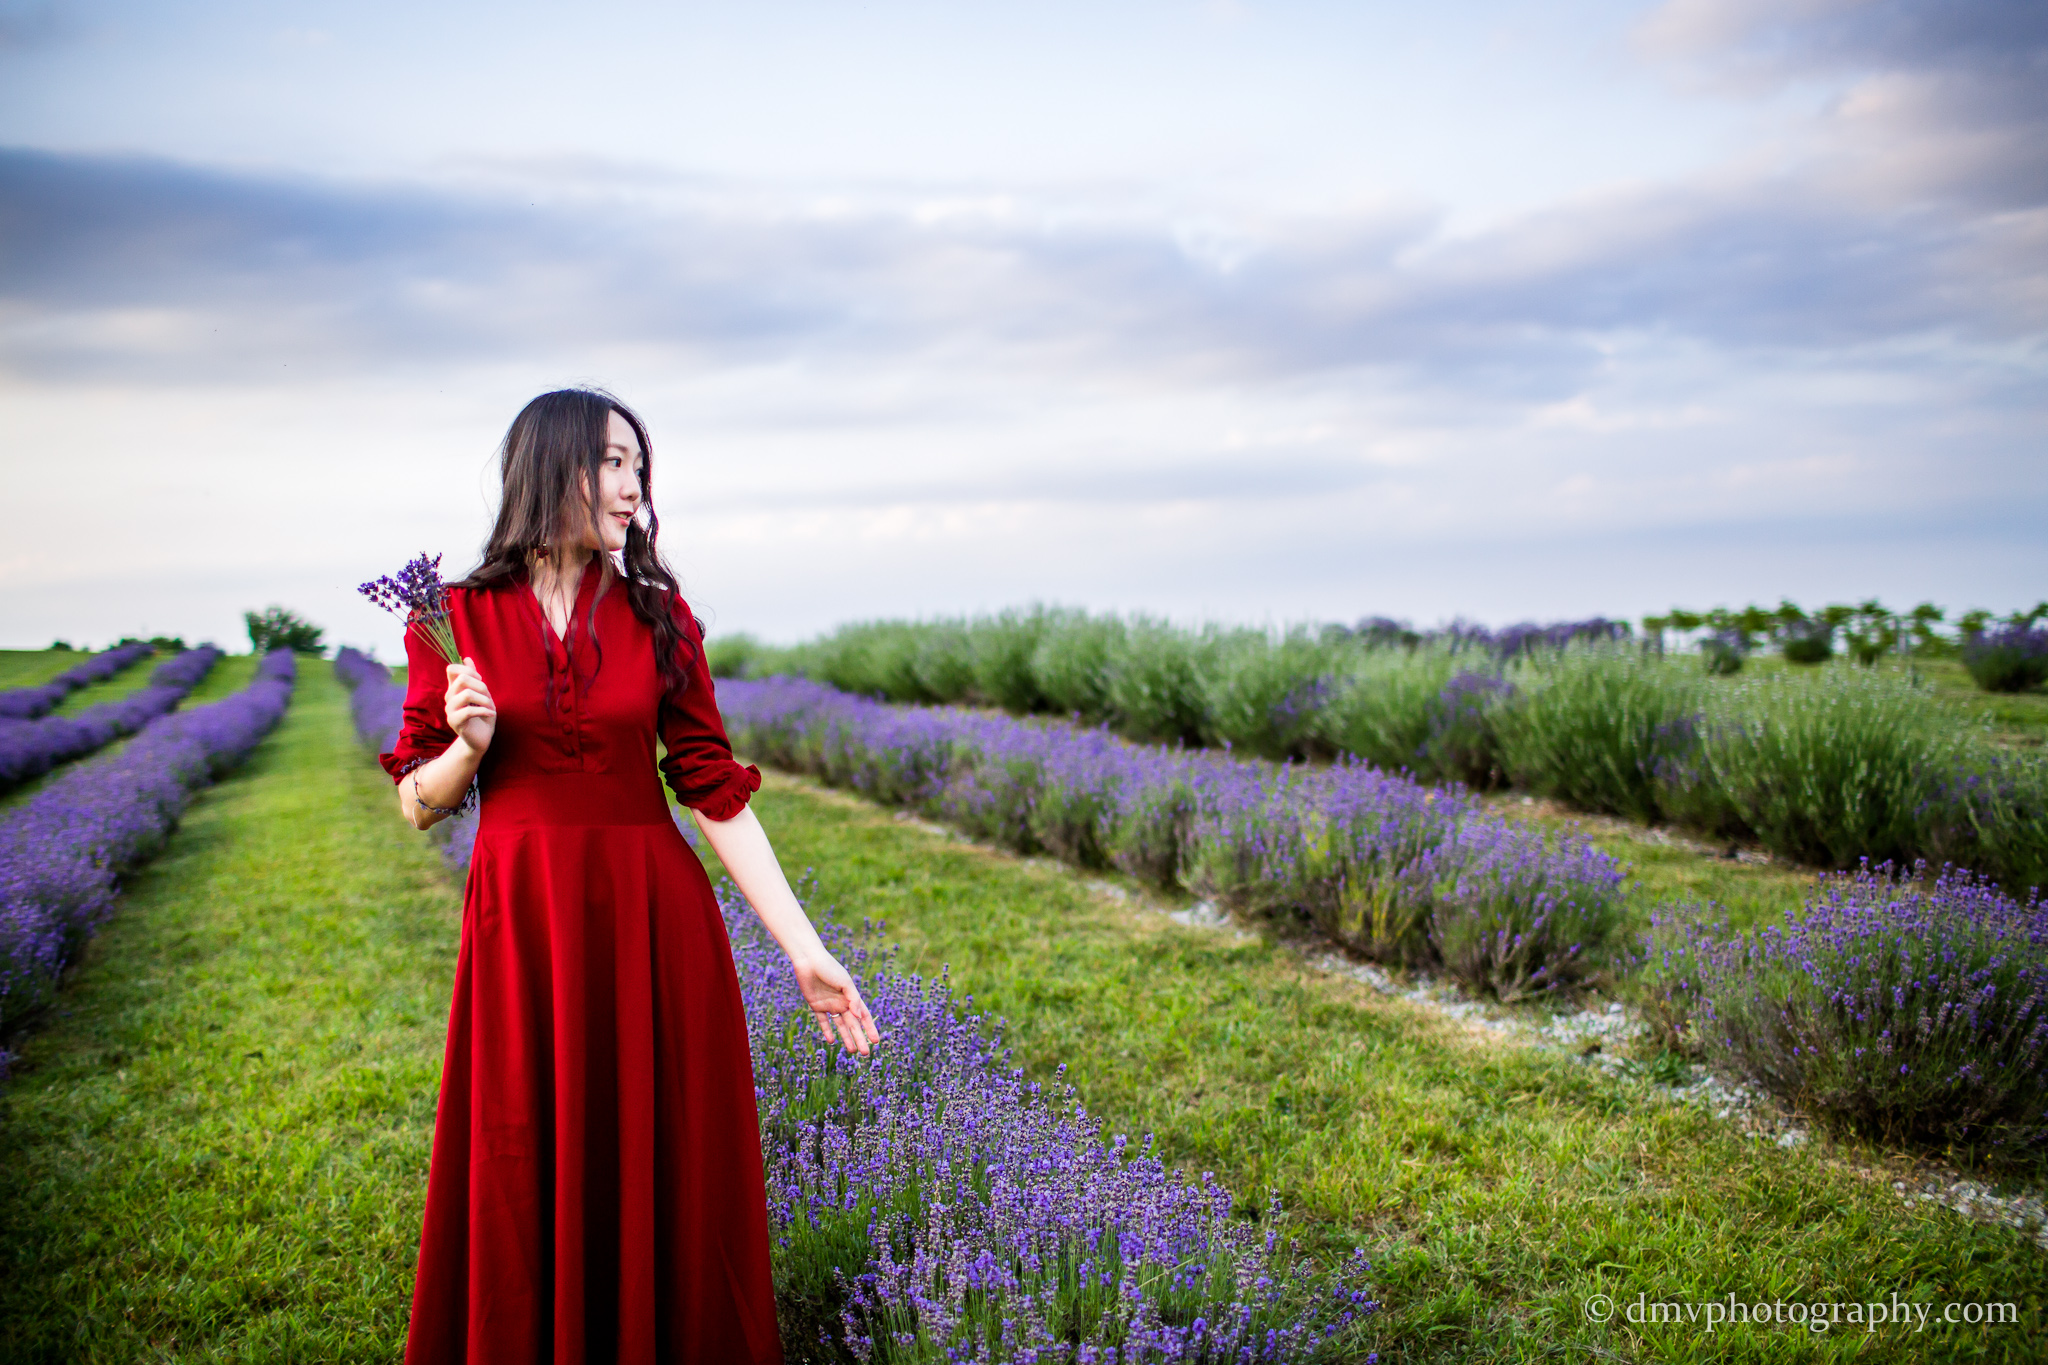 2016-06-24 - Zhu Xing - Lavender Field - 00044